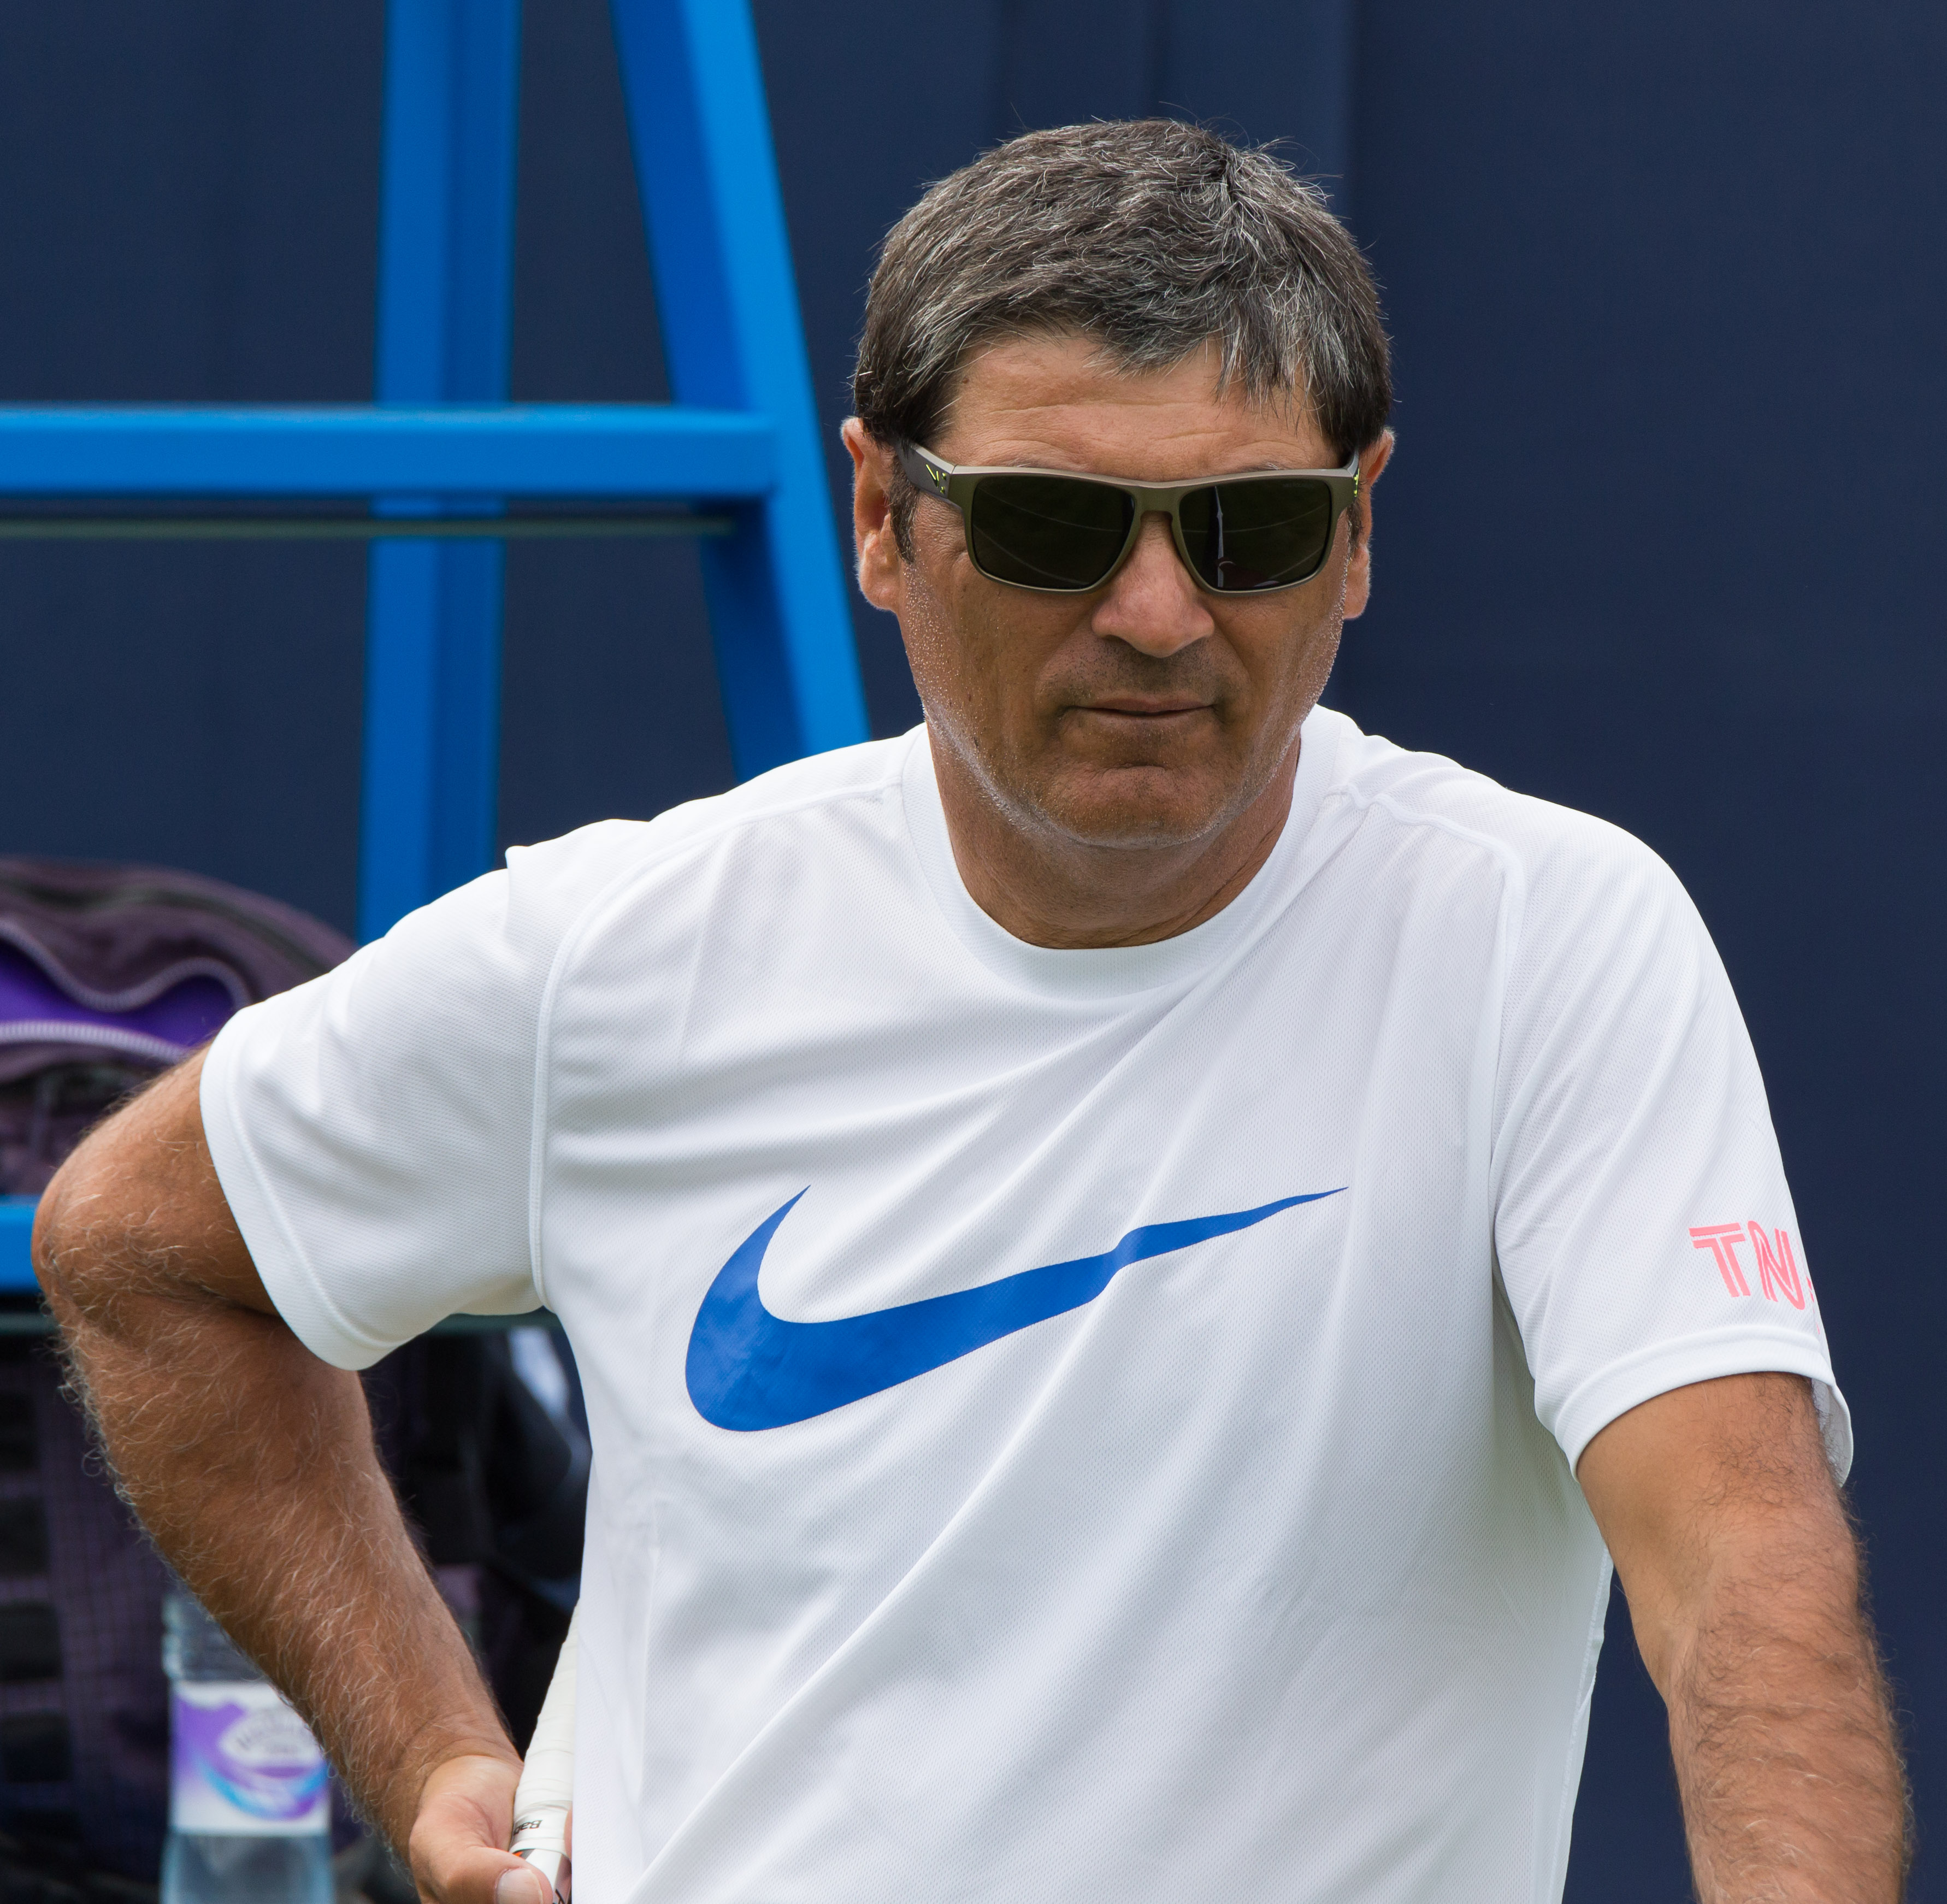 Toni_Nadal,_Aegon_Championships,_London,_UK_-_Diliff